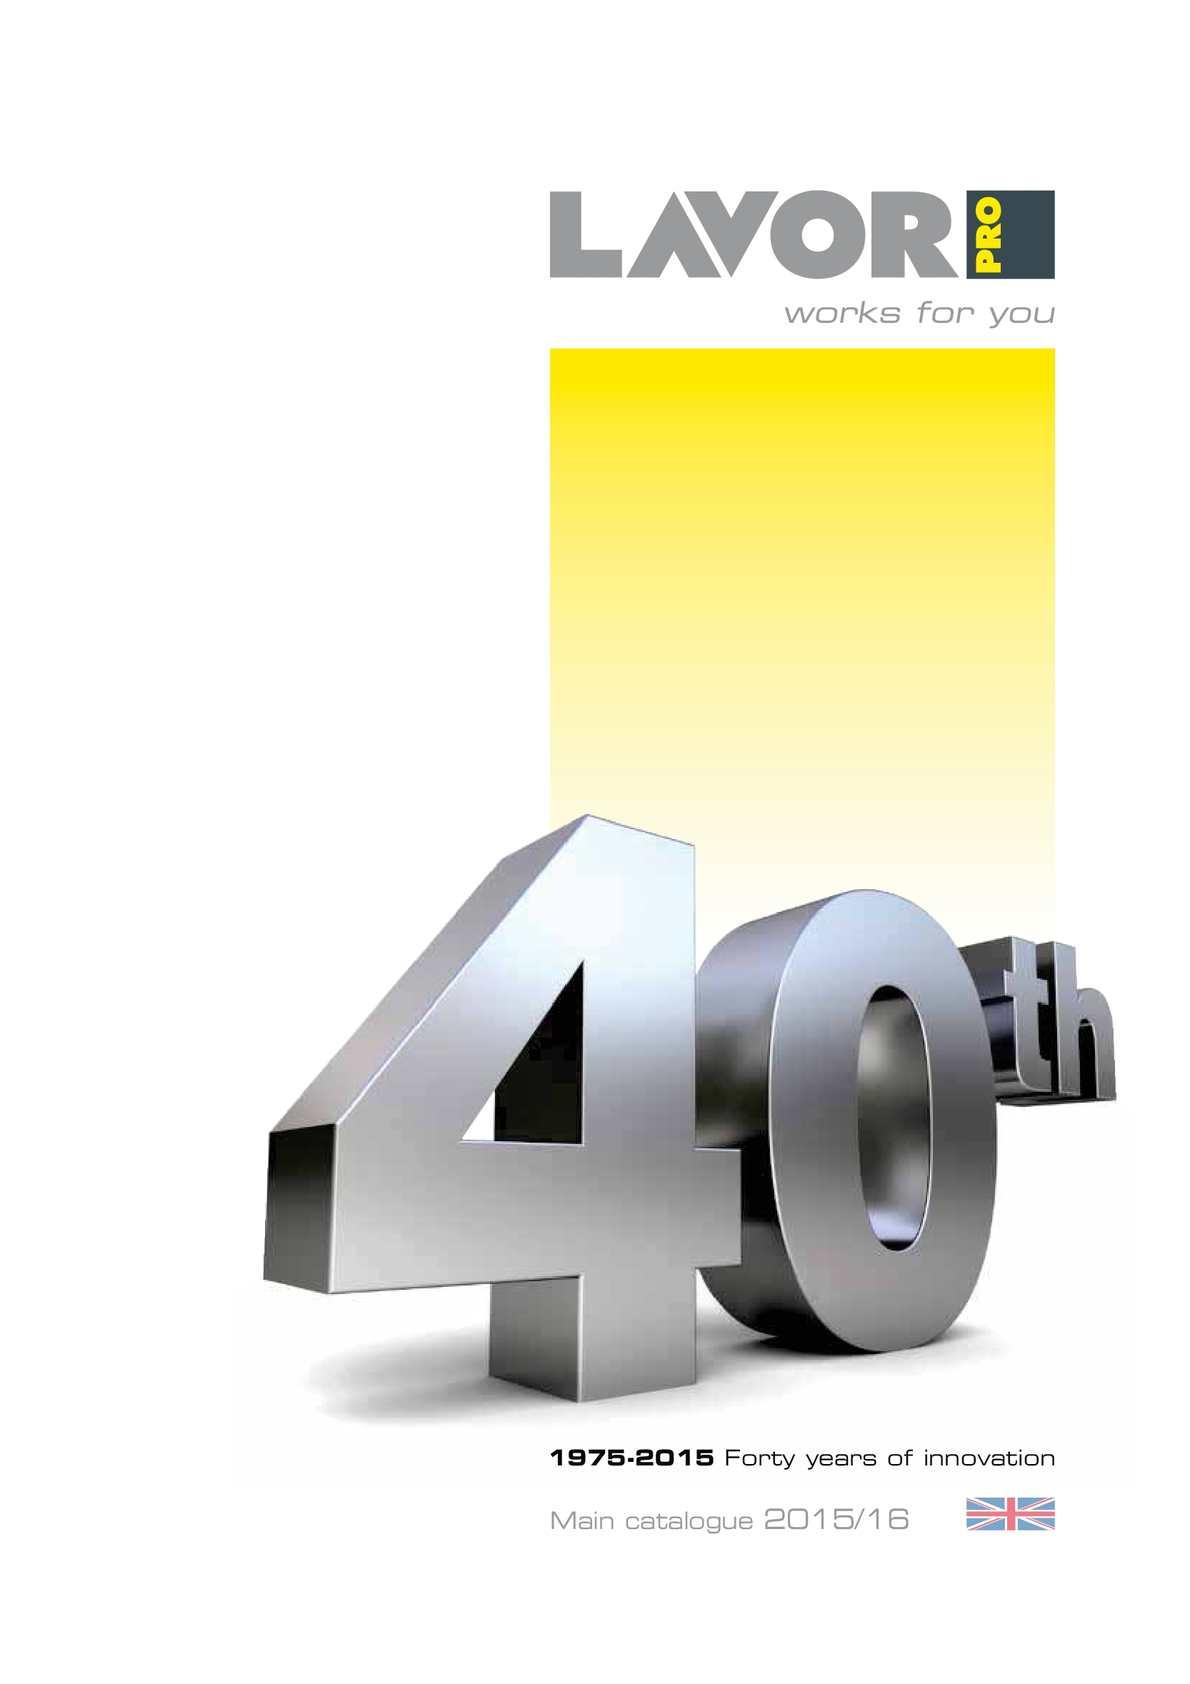 Calamo Main Catalogue Circuit Breaker 2 Pole 25a 230v 50 60hz For Gasoline Diesel Generators